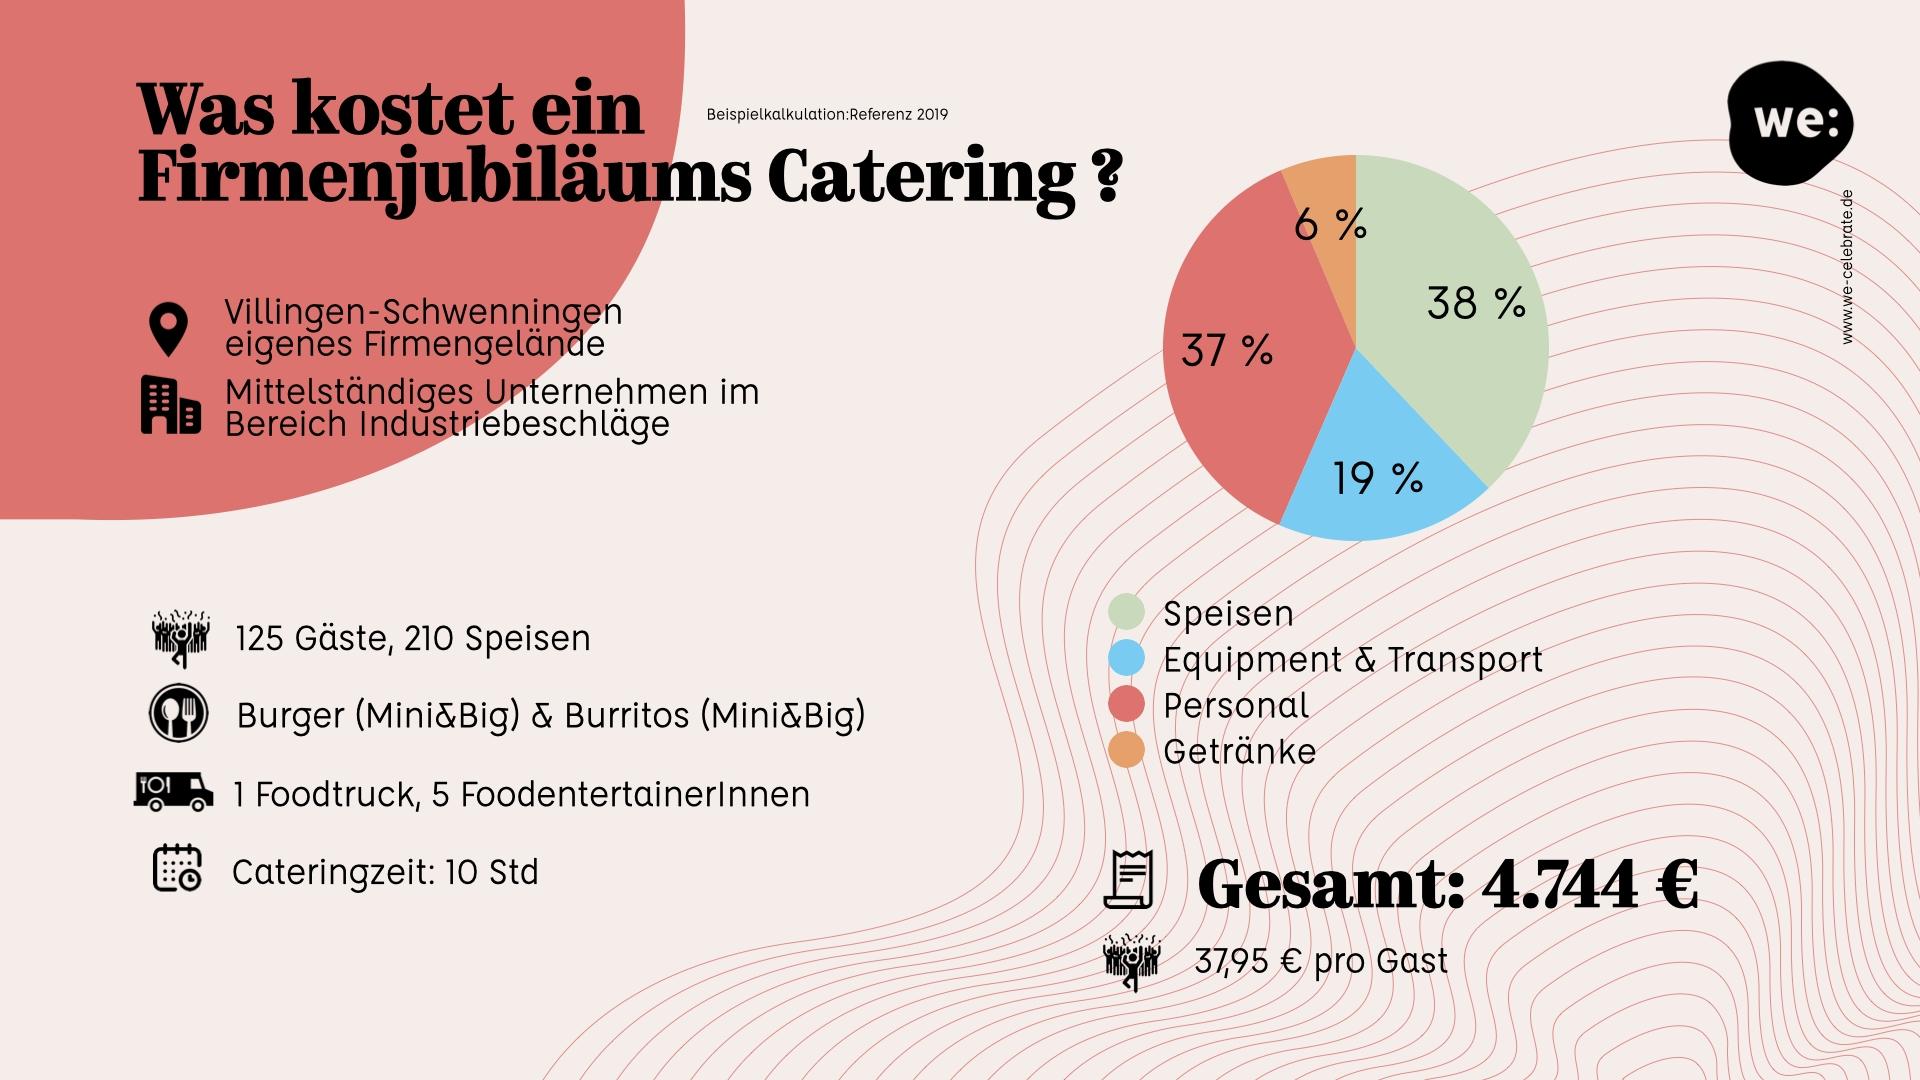 Kosten Firmenjubiläum Villingen-Schwenningen